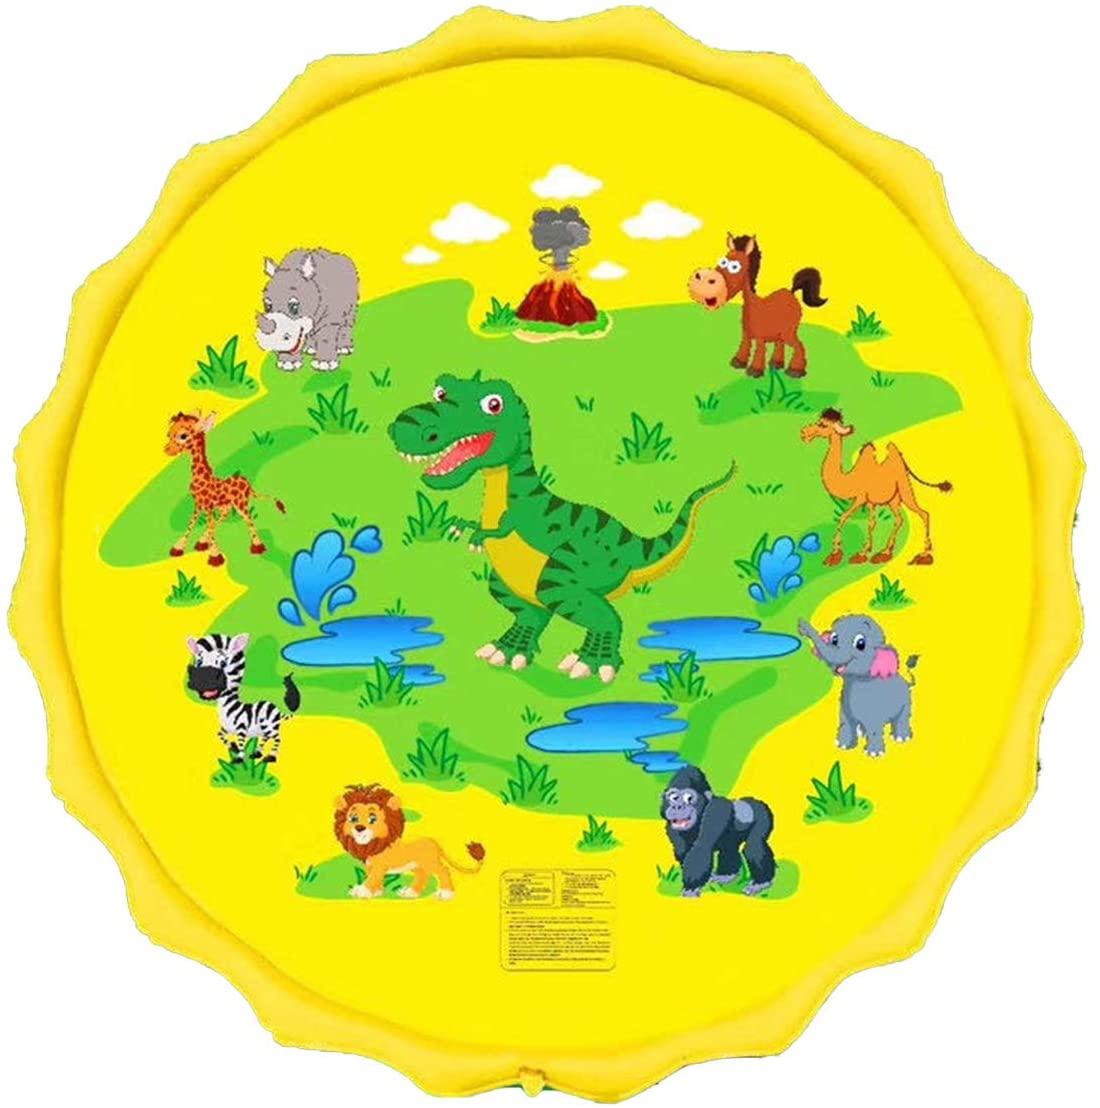 Great-hyc Kid Toddler Cartoon Dinosaur Pattern Inflatable Sprinkler Outdoor Water Play Pad